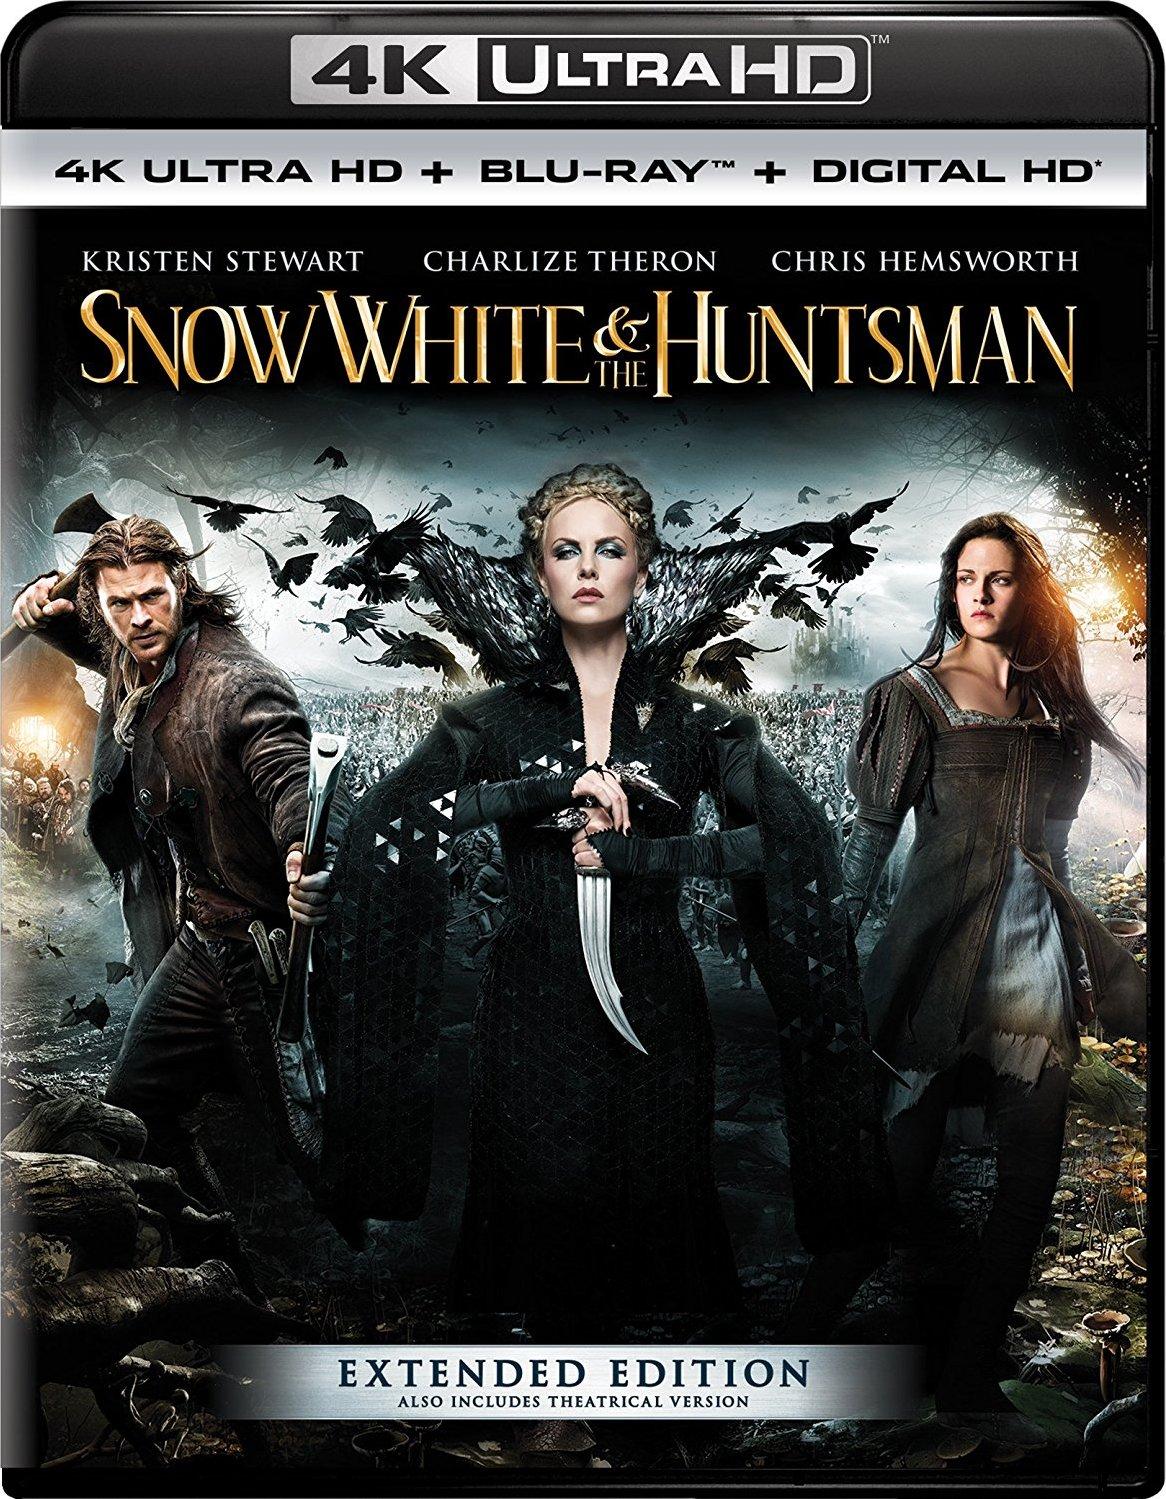 Snow White and the Huntsman (2012) 4K Ultra HD Blu-ray